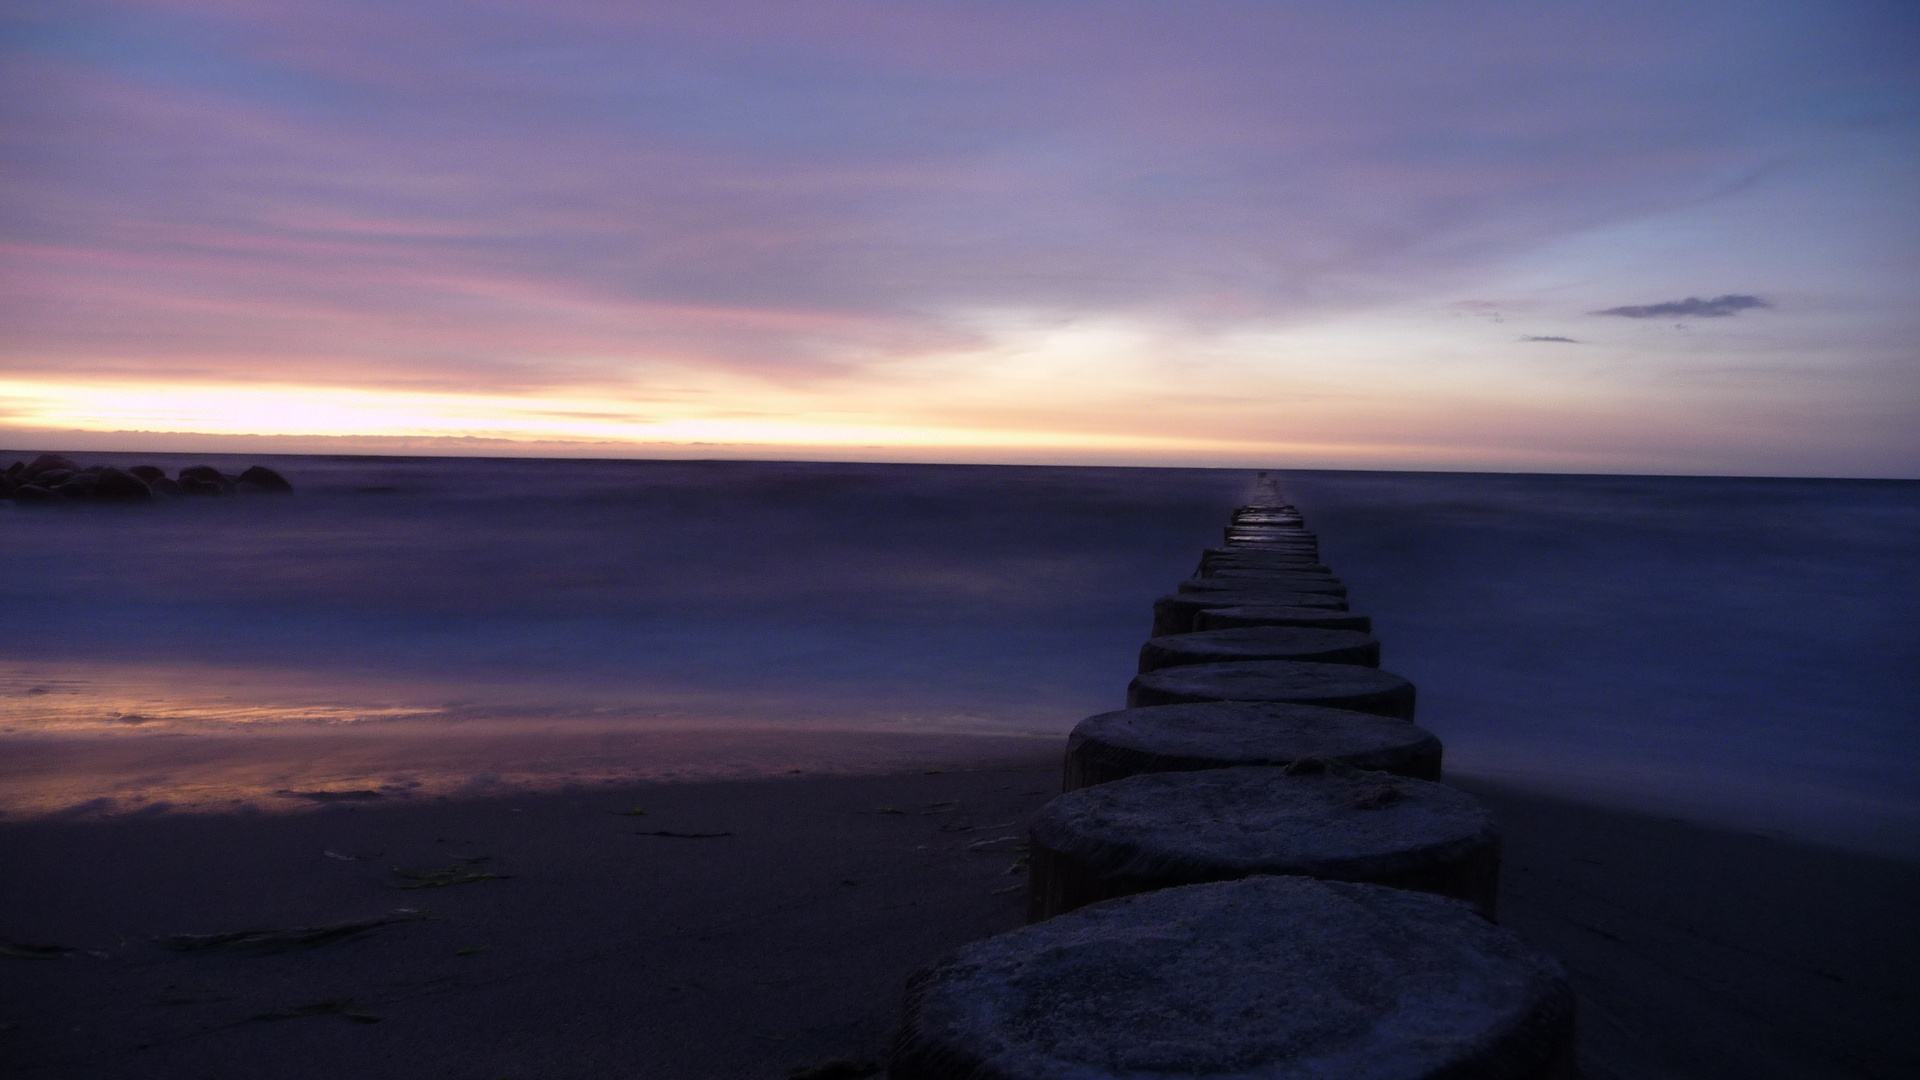 Ostsee Sonnenuntergang